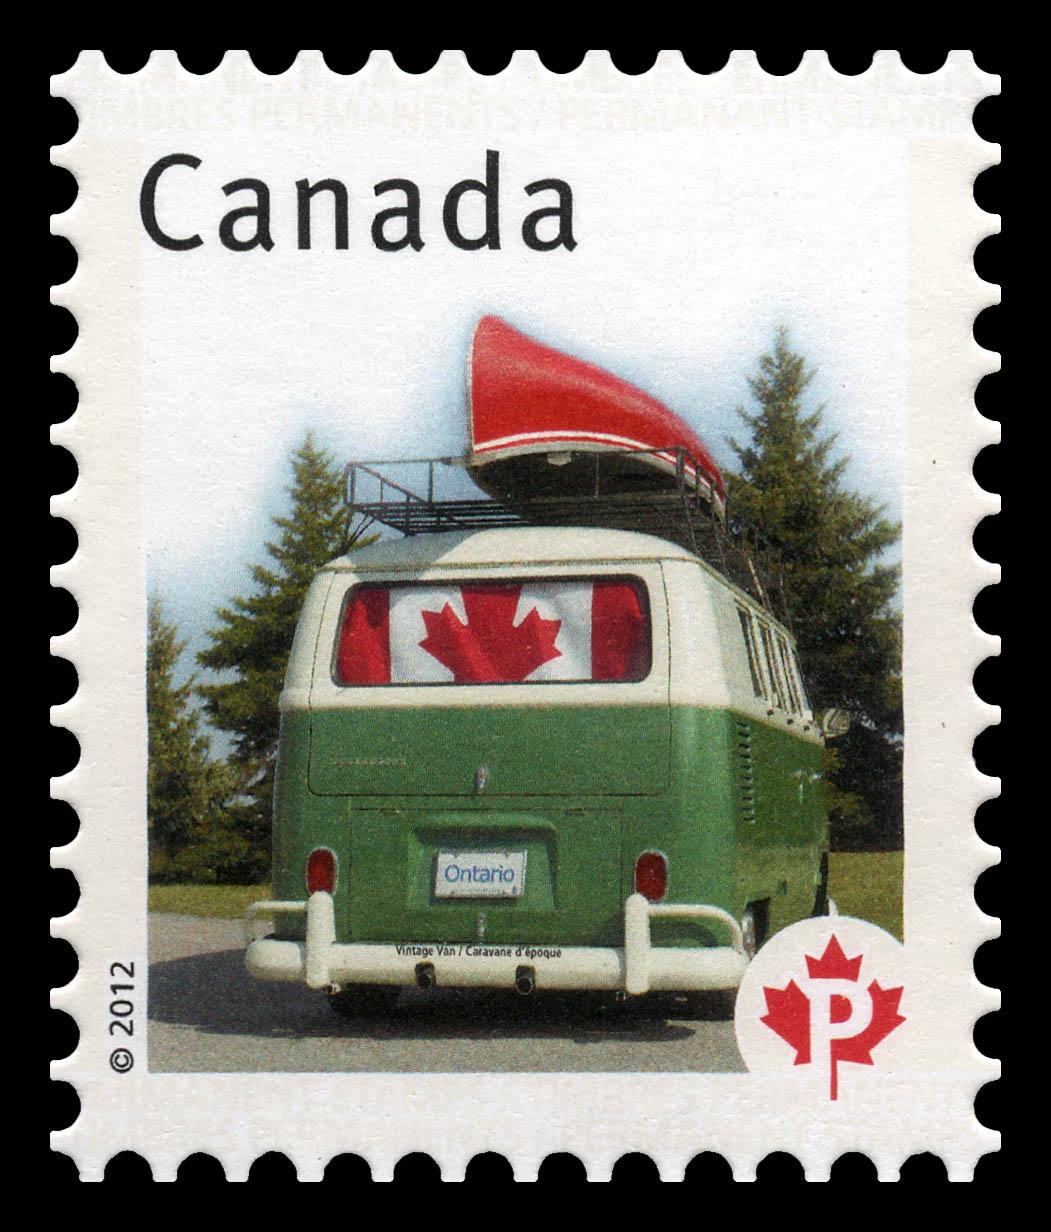 Vintage Van - Canadian Pride  Canada Postage Stamp   Canadian Pride - Definitives